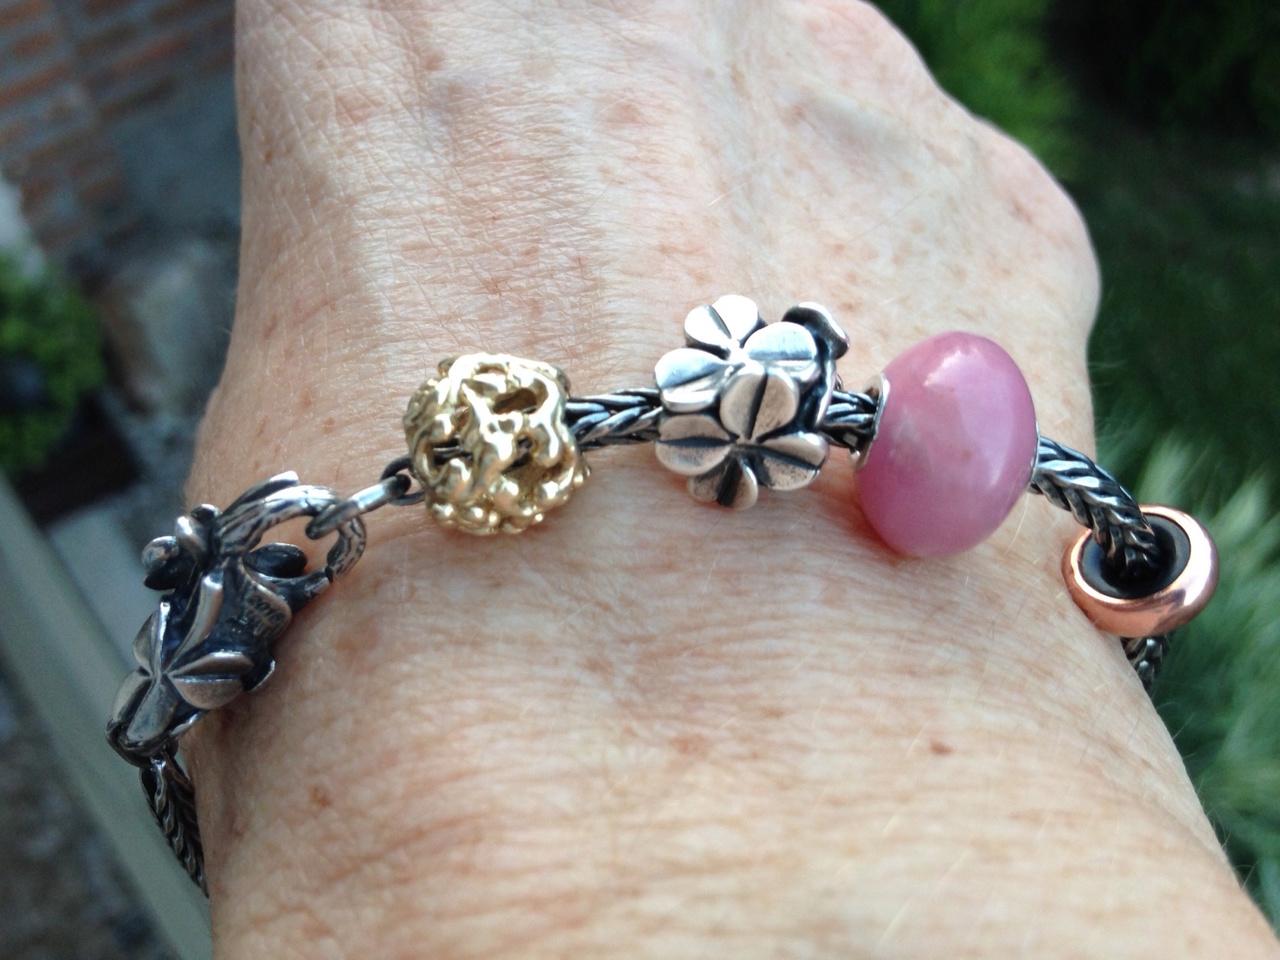 Show Your 40th Clover Bracelets - Page 2 Freund10